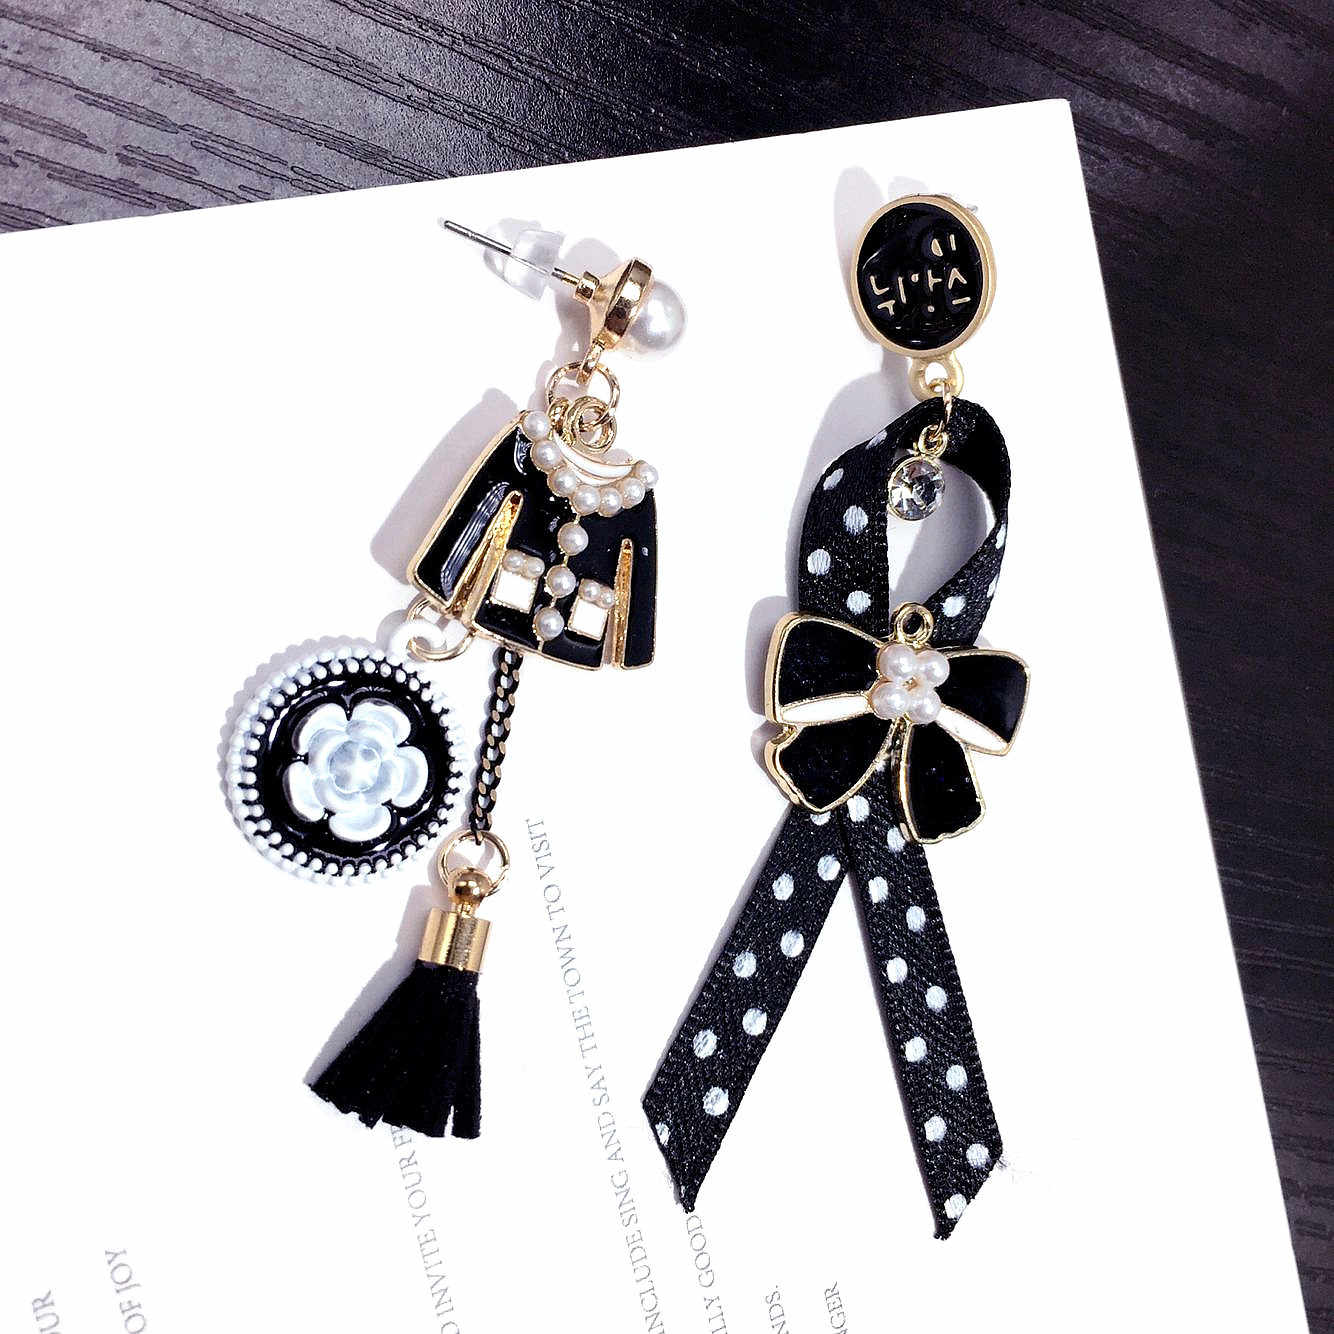 Asymmetric Creative Clothes Dot Bow Earrings Long Tassel cc Earrings Chic  Net Red Fashion Earrings 42e31a25e710